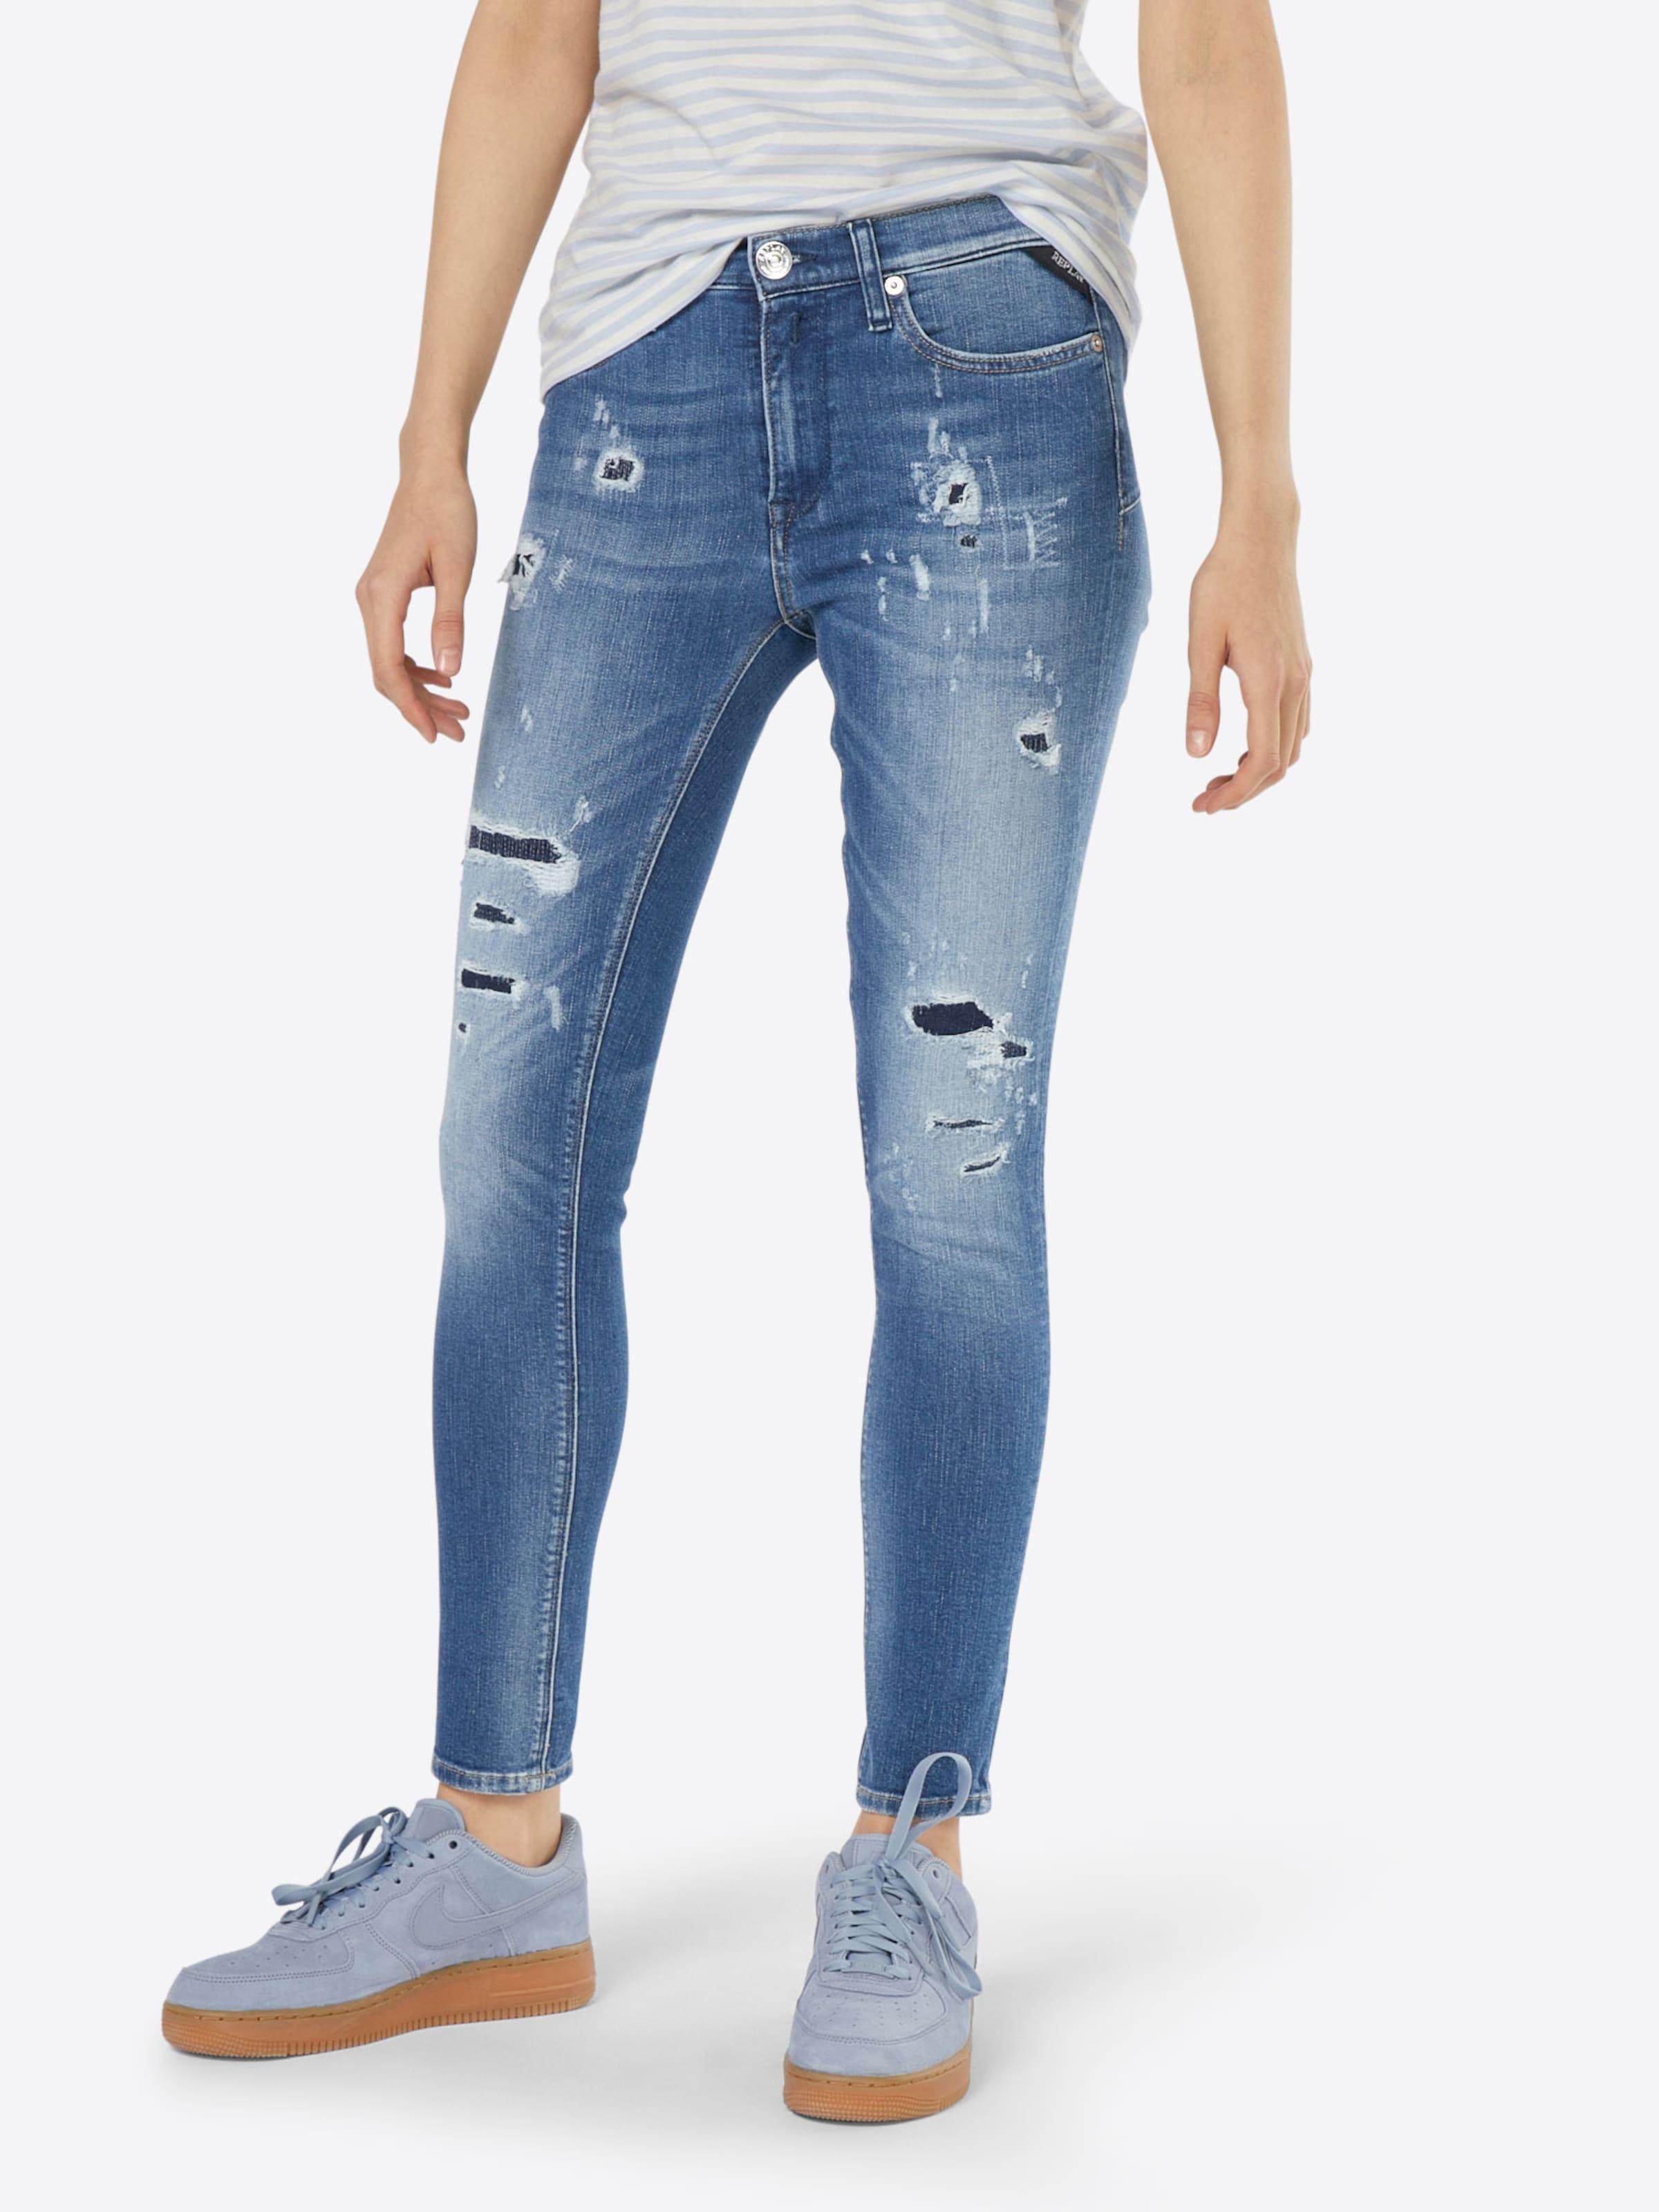 REPLAY 'ELAEBER' Jeans Rabatt Ebay Auslass Sast Günstig Kaufen Neue Ankunft Geringster Preis Klassisch aMzGfAh